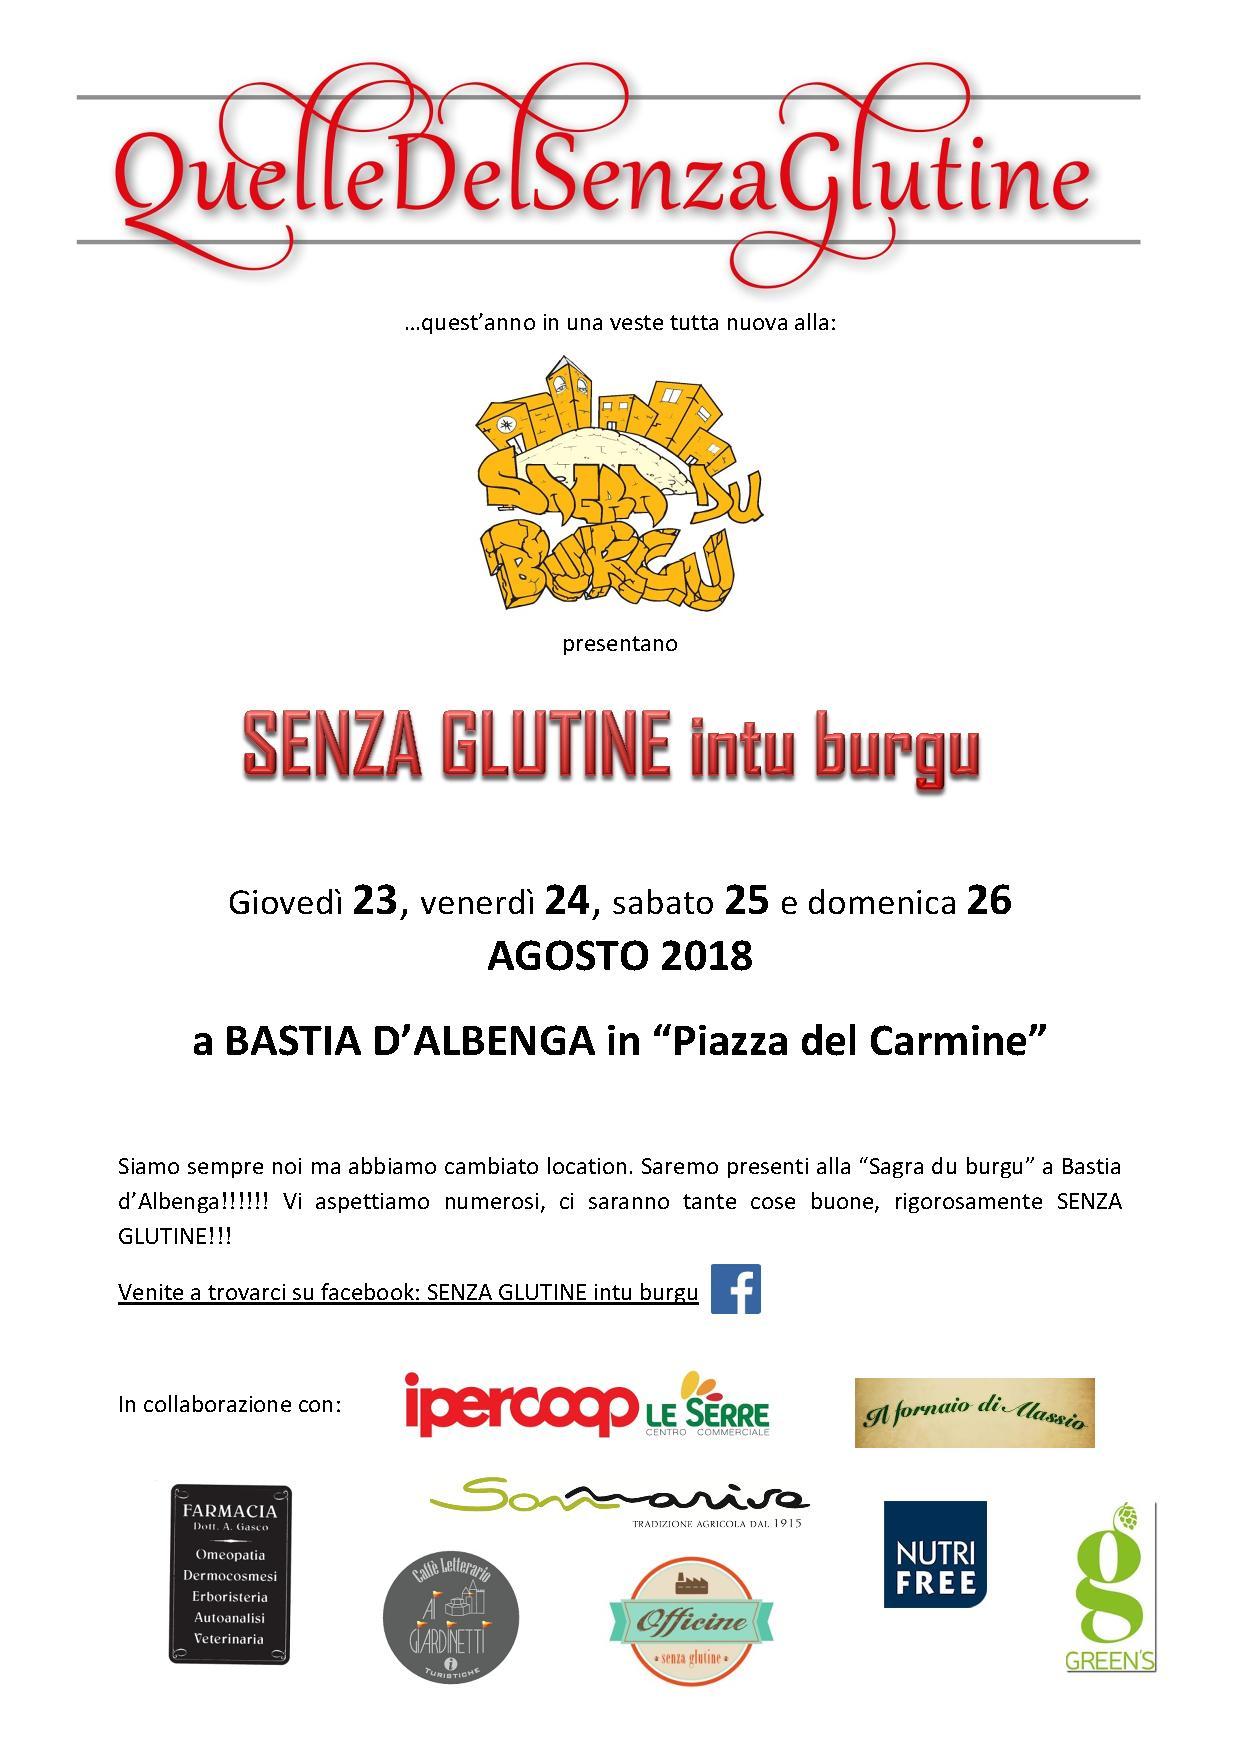 Senza glutine Intu Burgu - Le Green's alla Sagra du Burgu a Bastia d'Albenga (SV)